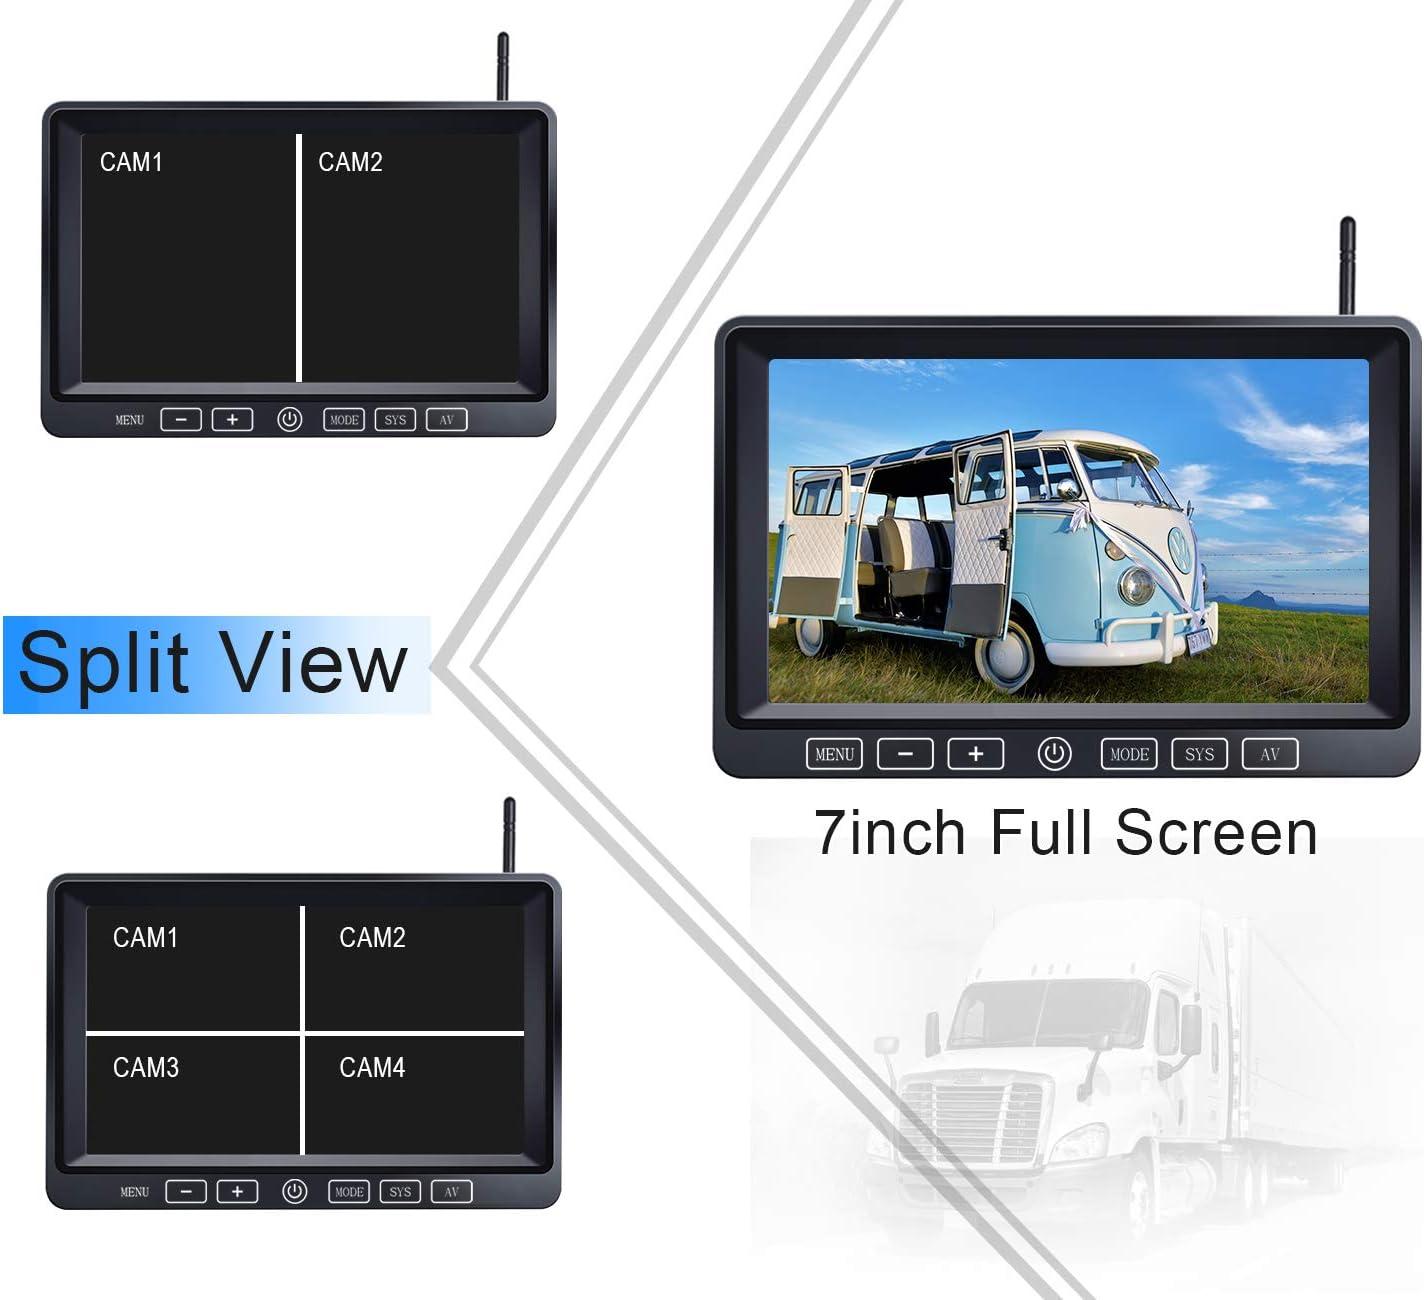 7/'/' DVR Split Monitor with Touch Button for RV//Truck//Trailer//Bus//Pickup//Van-B3C ZEROXCLUB Digital Wireless Backup Camera System Kit,HD 1080P /& IP69 Waterproof Wireless Reverse Rear Side View Camera